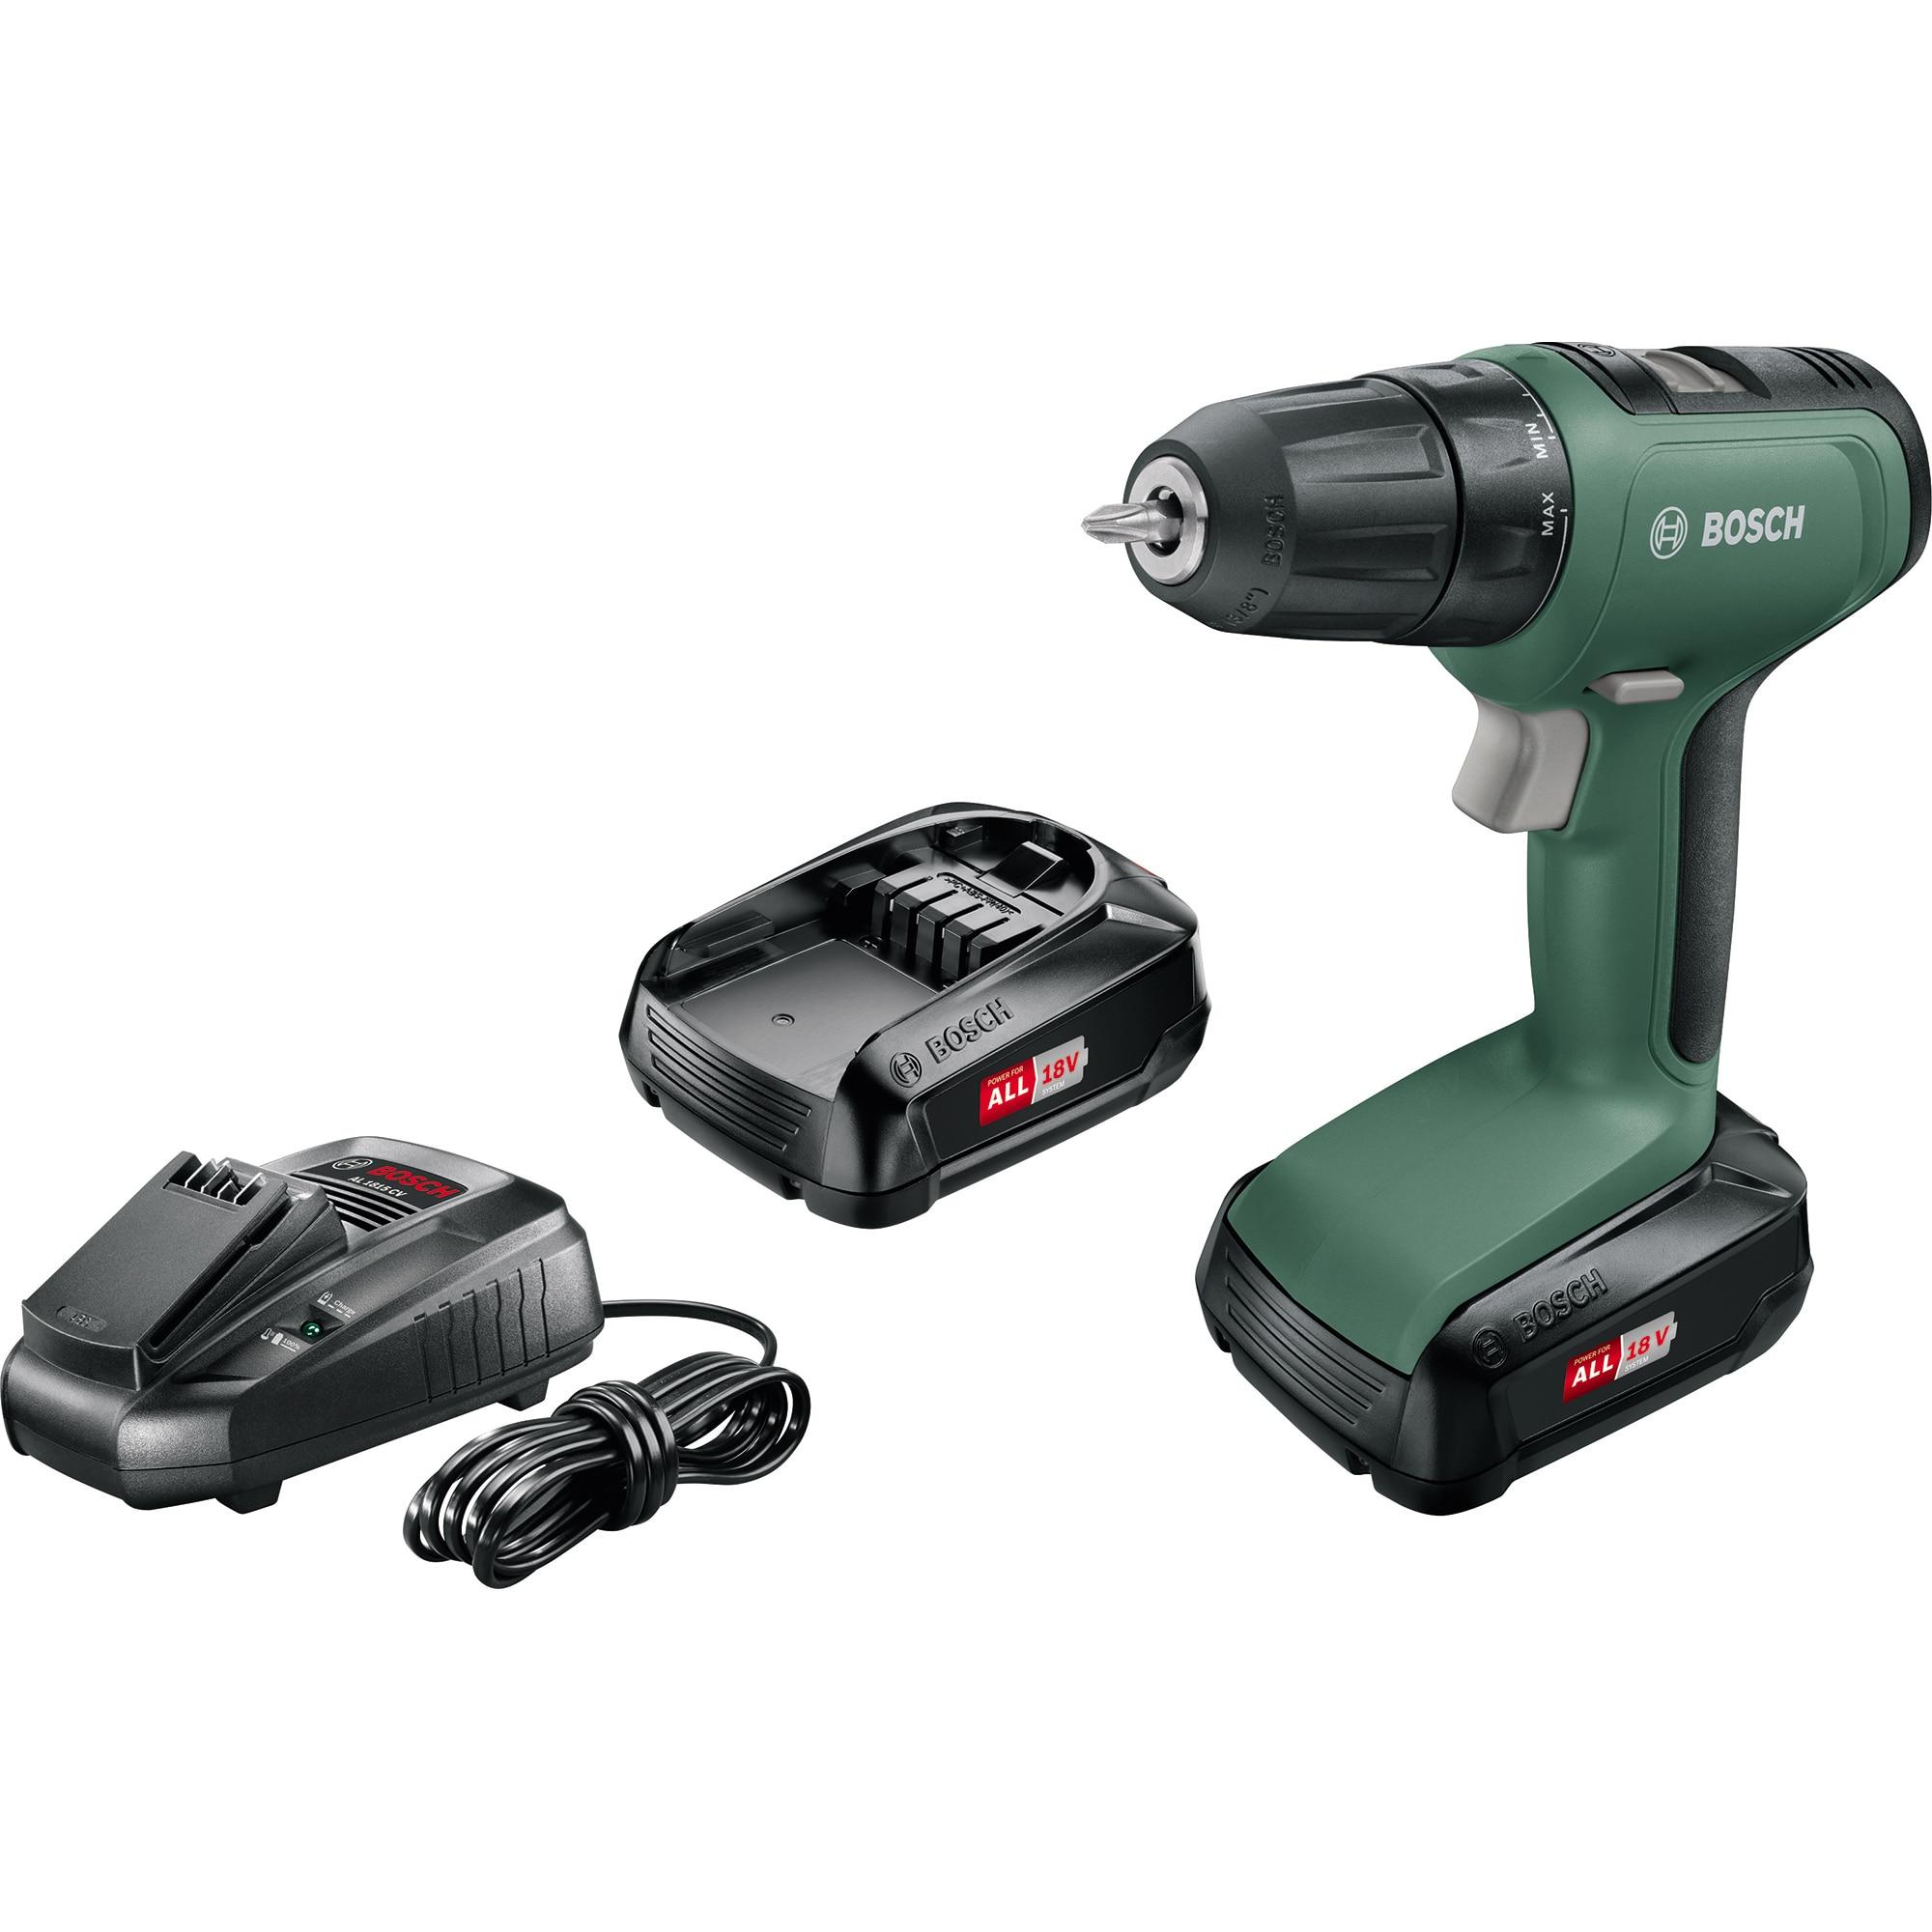 Fotografie Masina de gaurit si insurubat (bormasina) pe acumulator Bosch UniversalDrill 18, 18 V, 1.5 AH, 1450 RPM, 30 Nm, accesorii incluse